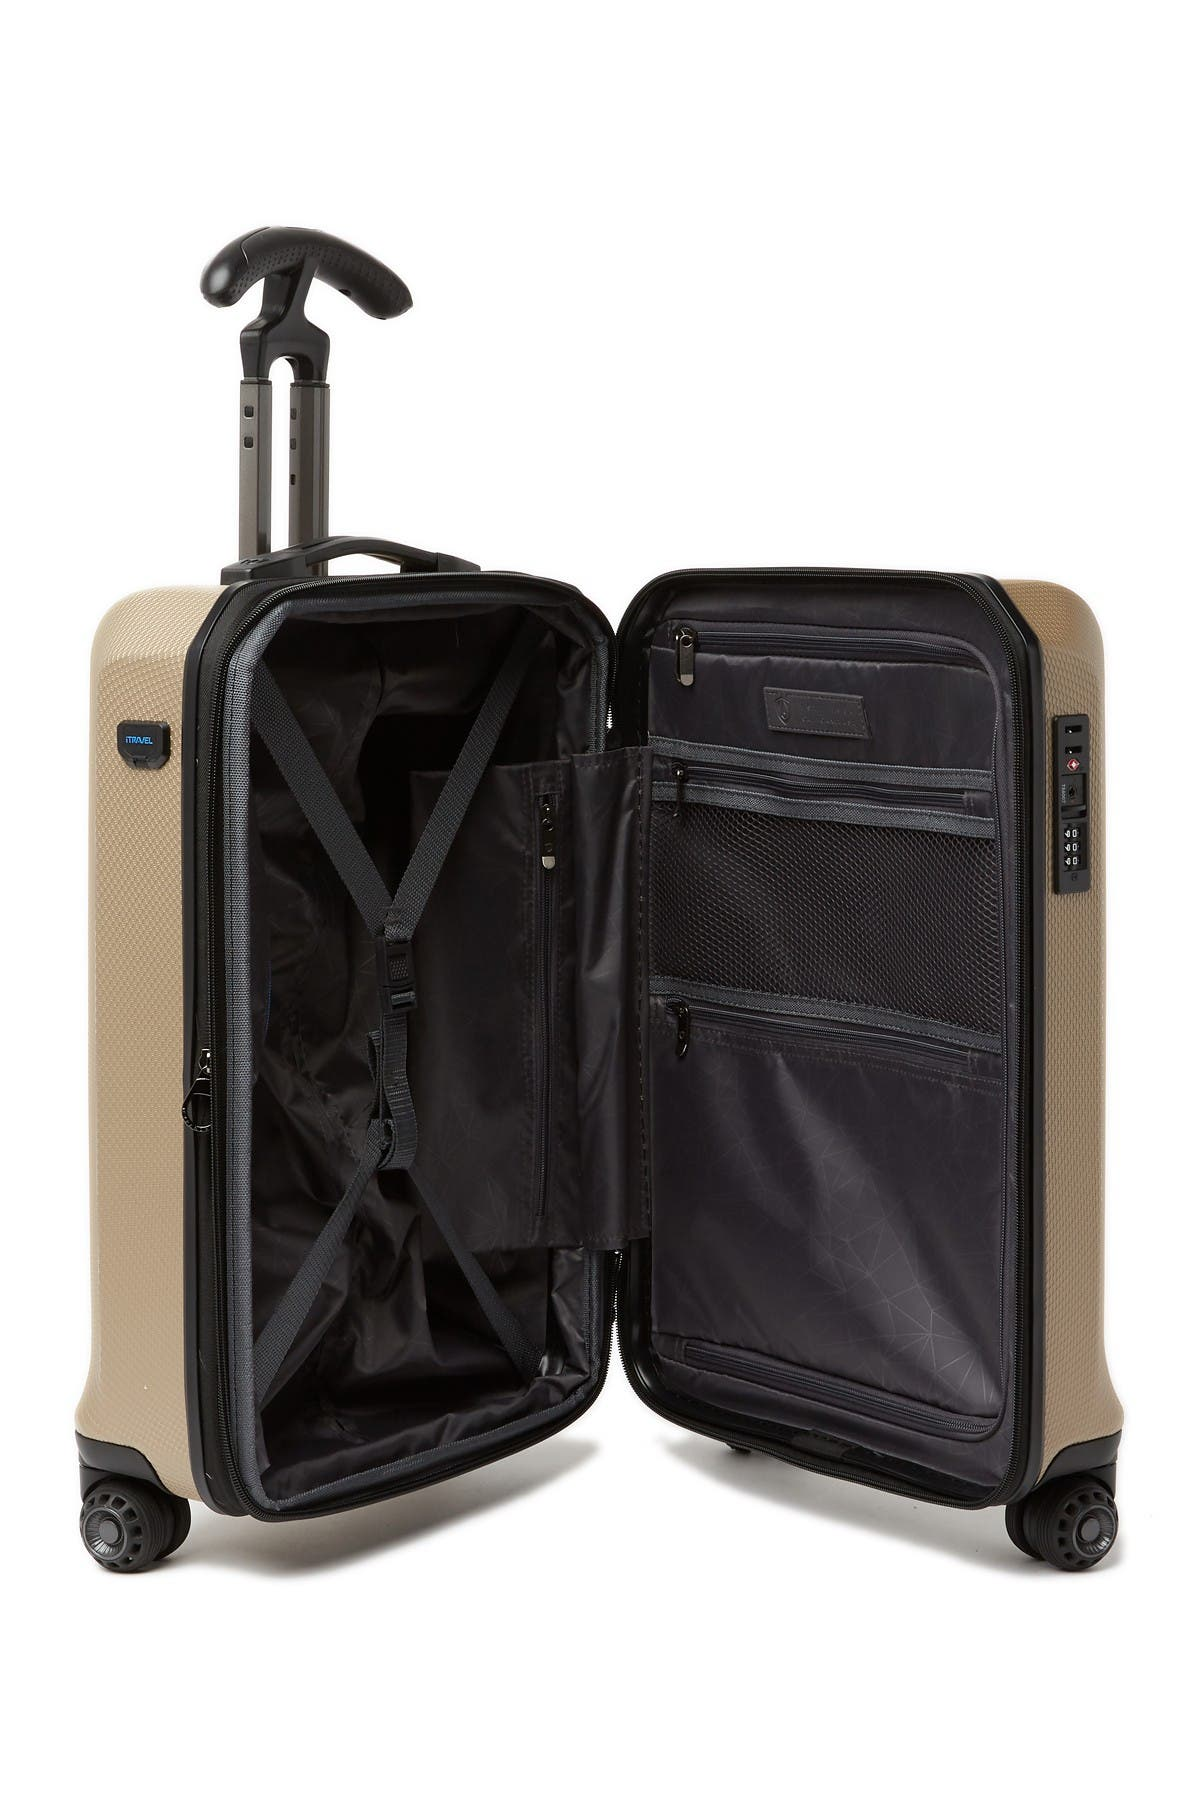 "Traveler's Choice Luggage Zendy 21"" Hardside Spinner"